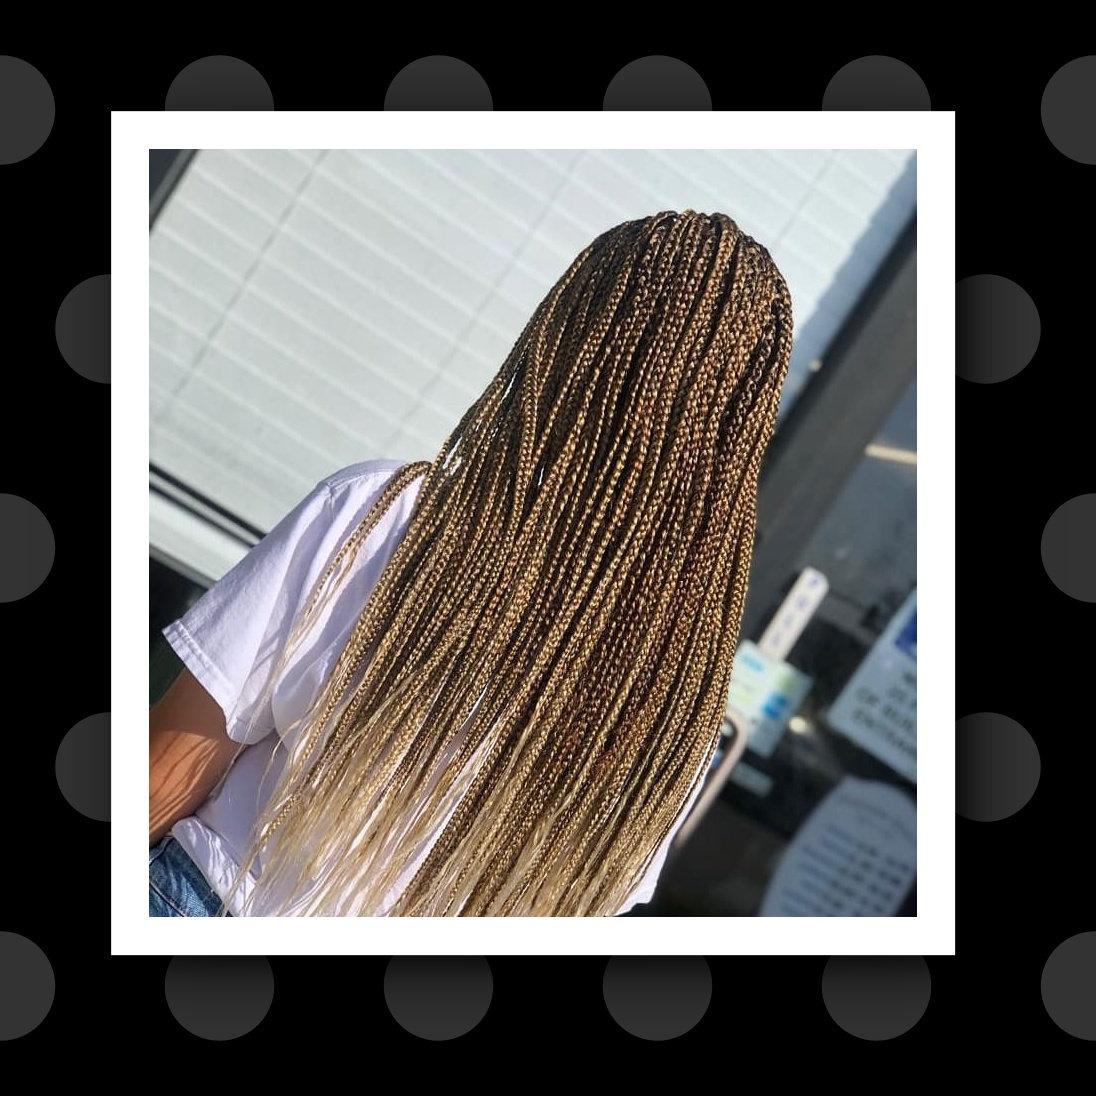 Indi/box braids with 56'' hair (6_7 hrs)